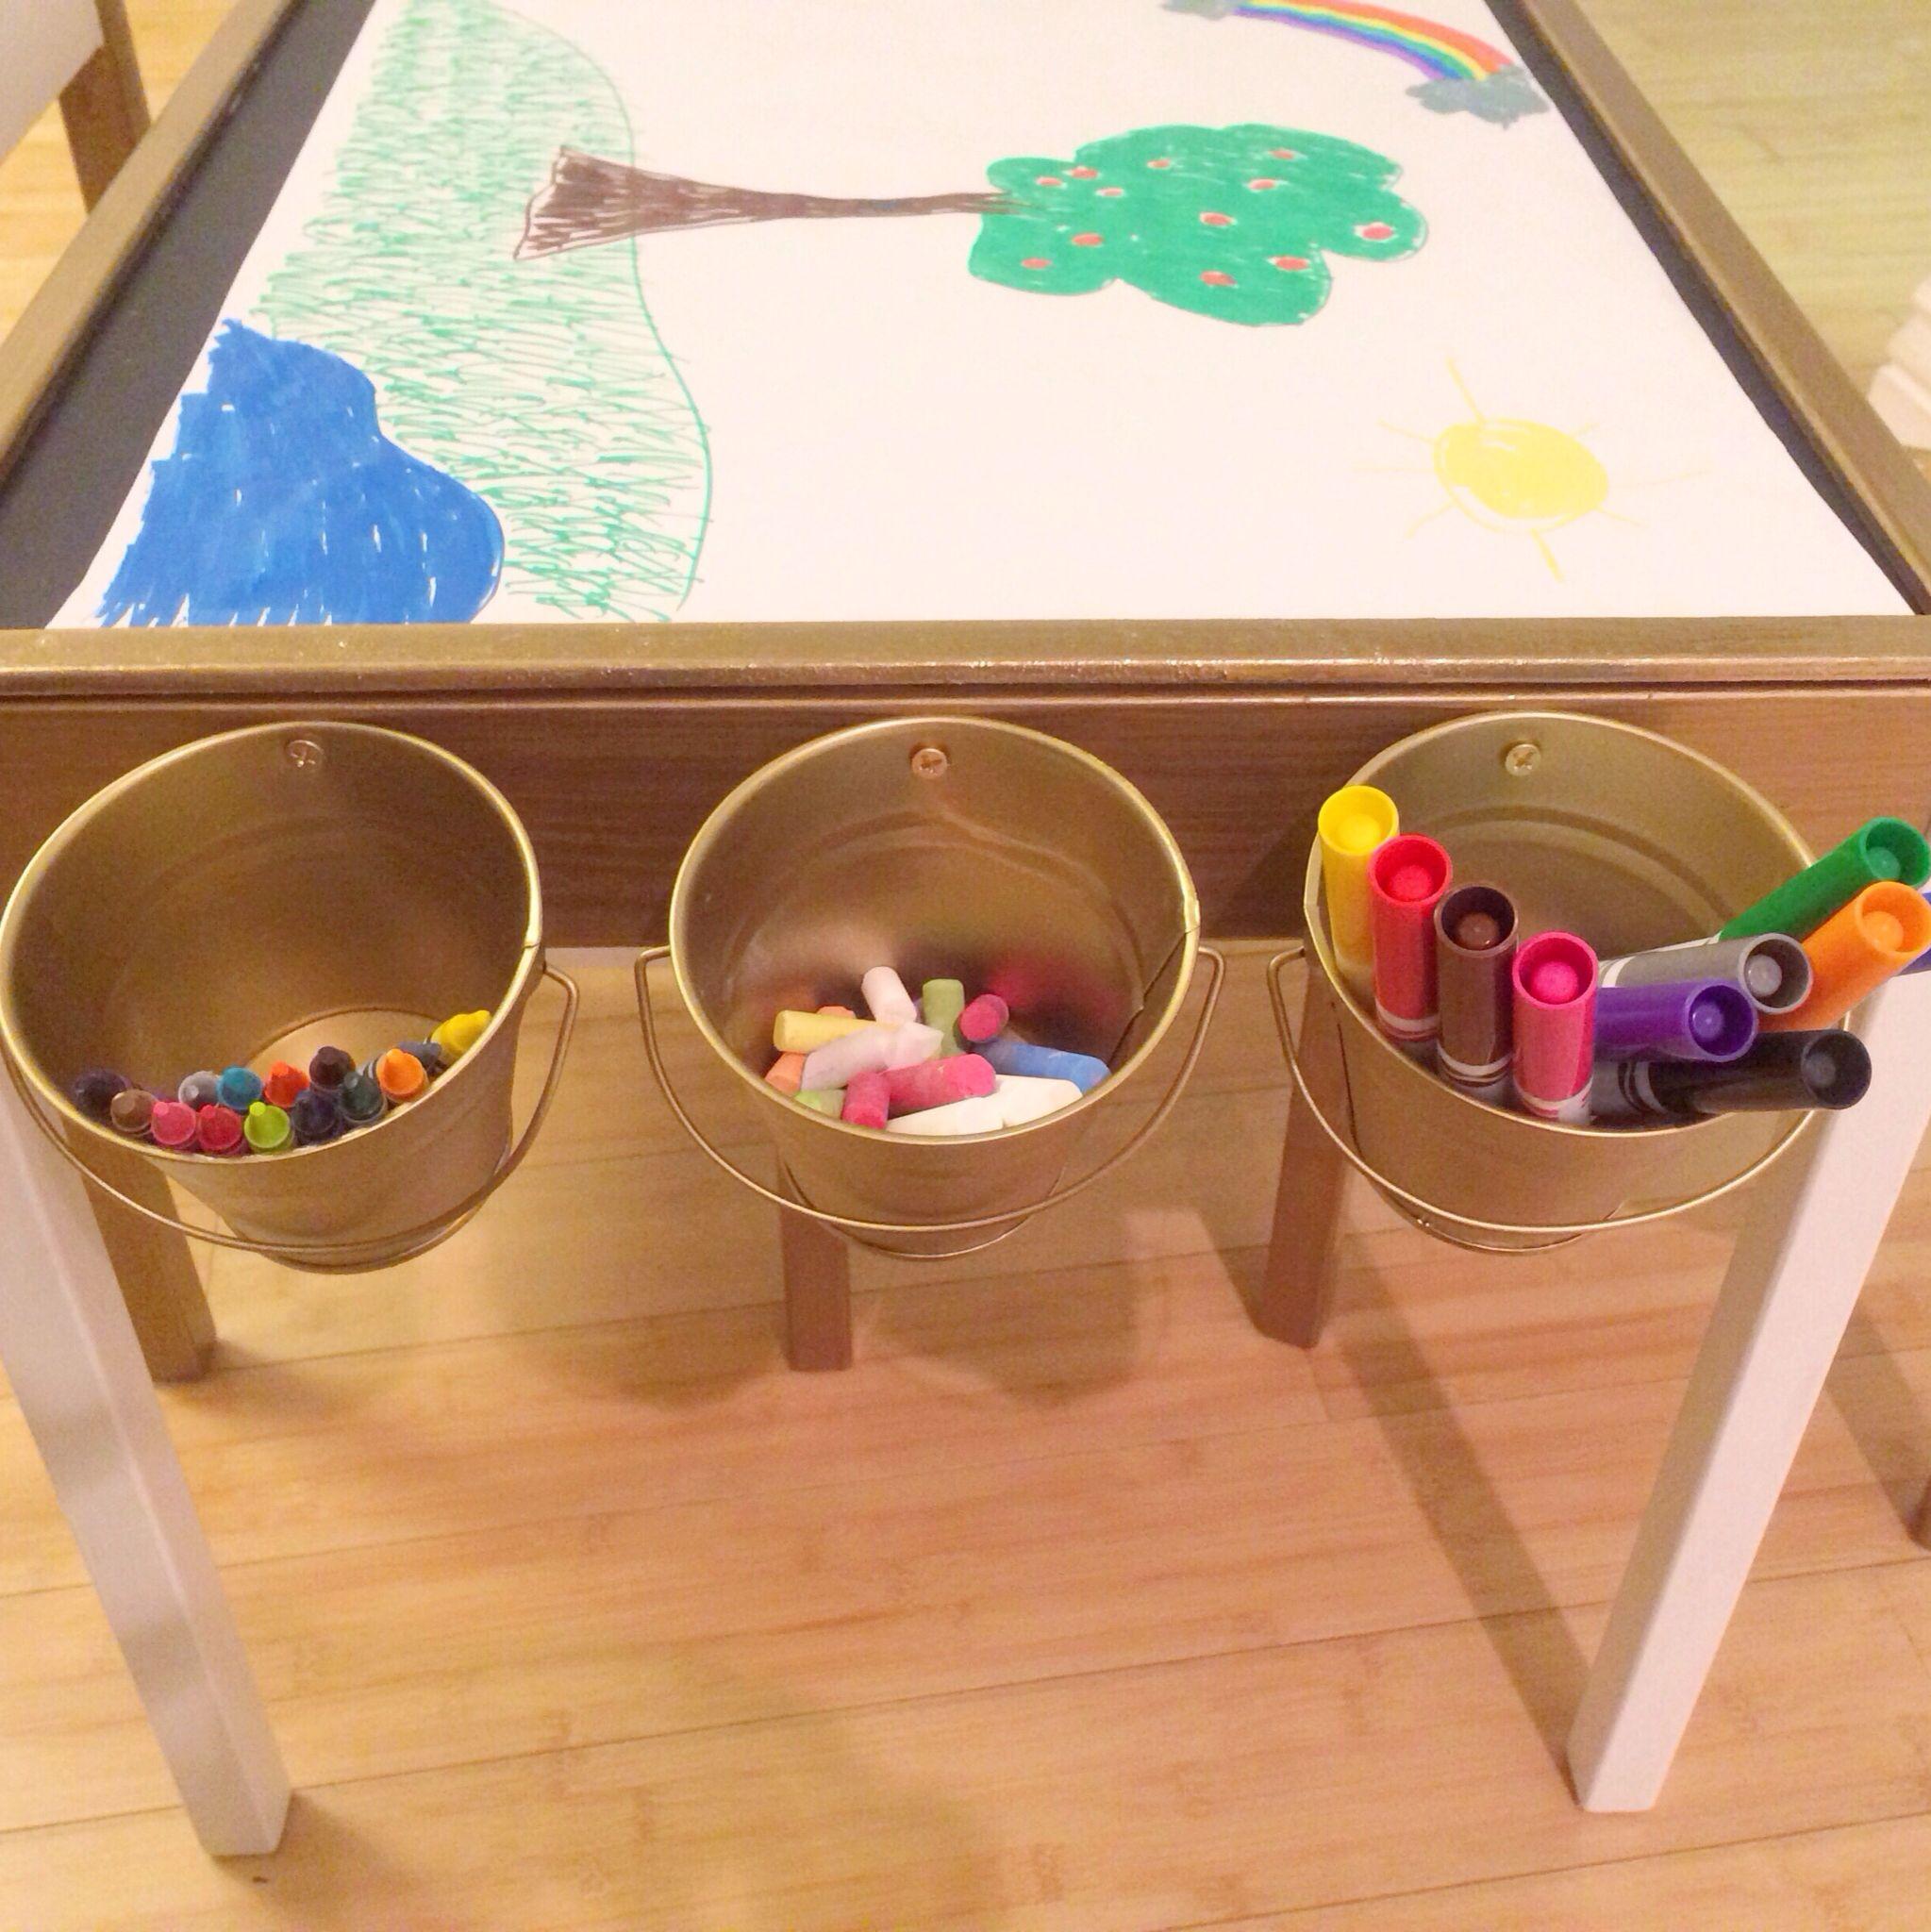 Our Ikea Latt Hack Art Table! Vinyl Upholstered Seats, Chalkboard Top, Roll  Of Art Paper Mounted Underneath.